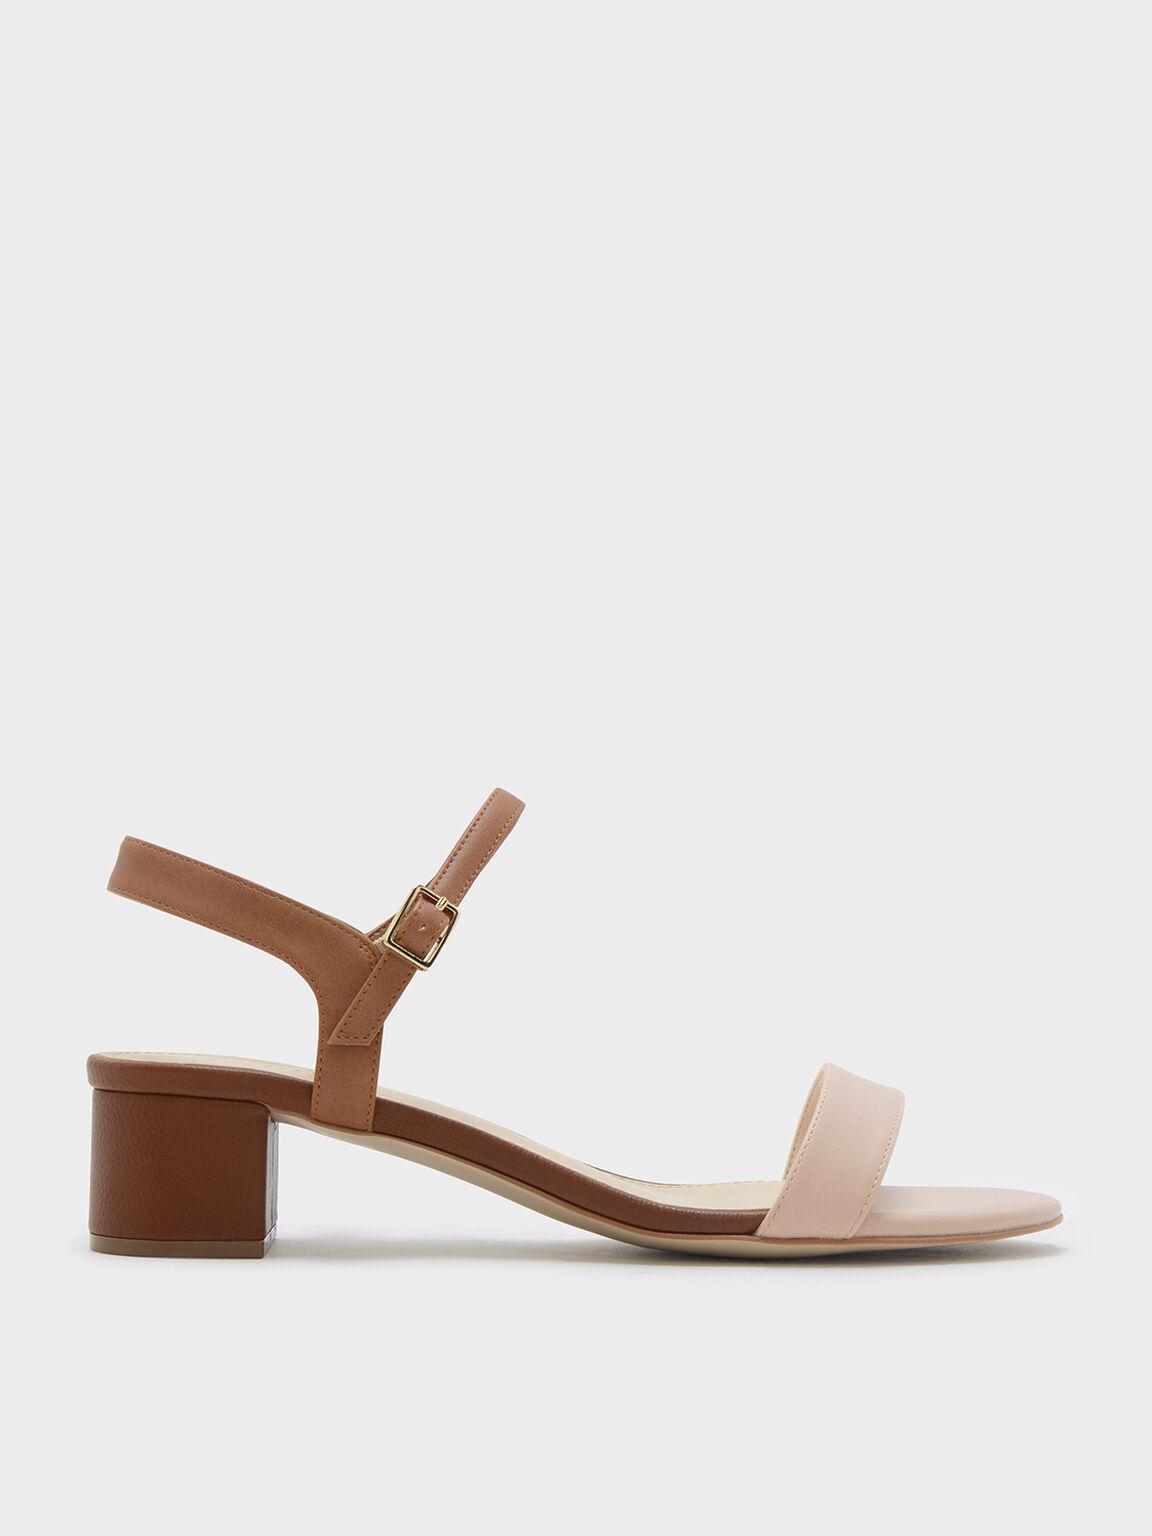 Basic Open-Toe Sandals, Multi, hi-res